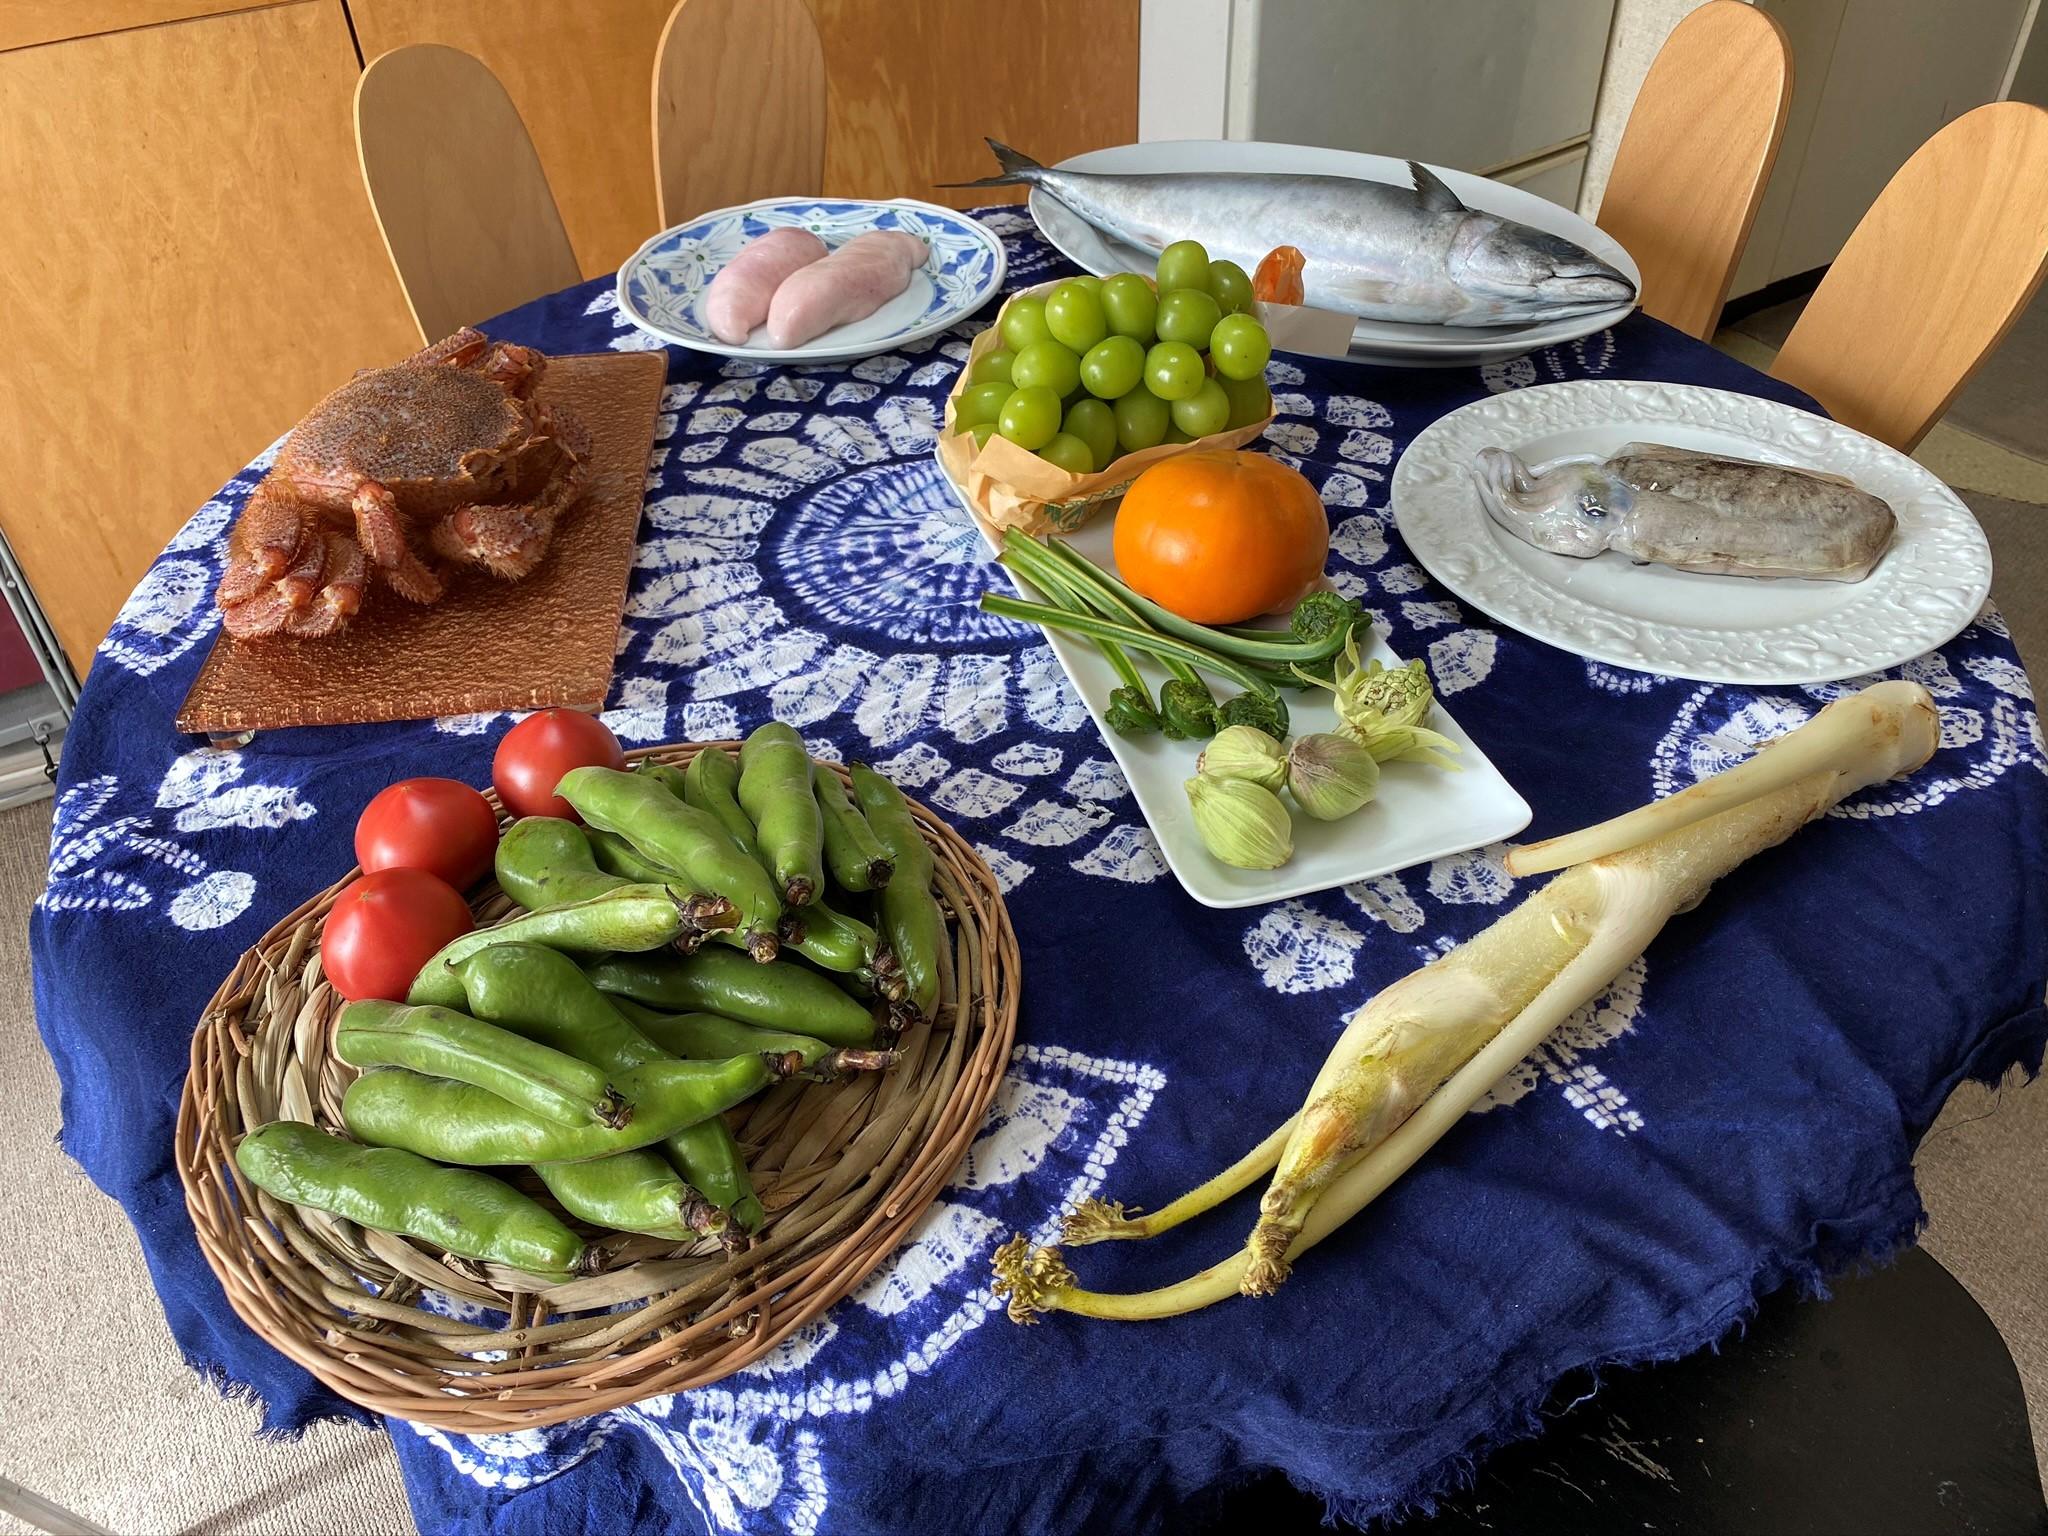 Mesa com pescados e vegetais in natura comprados no mercado Tsukiji